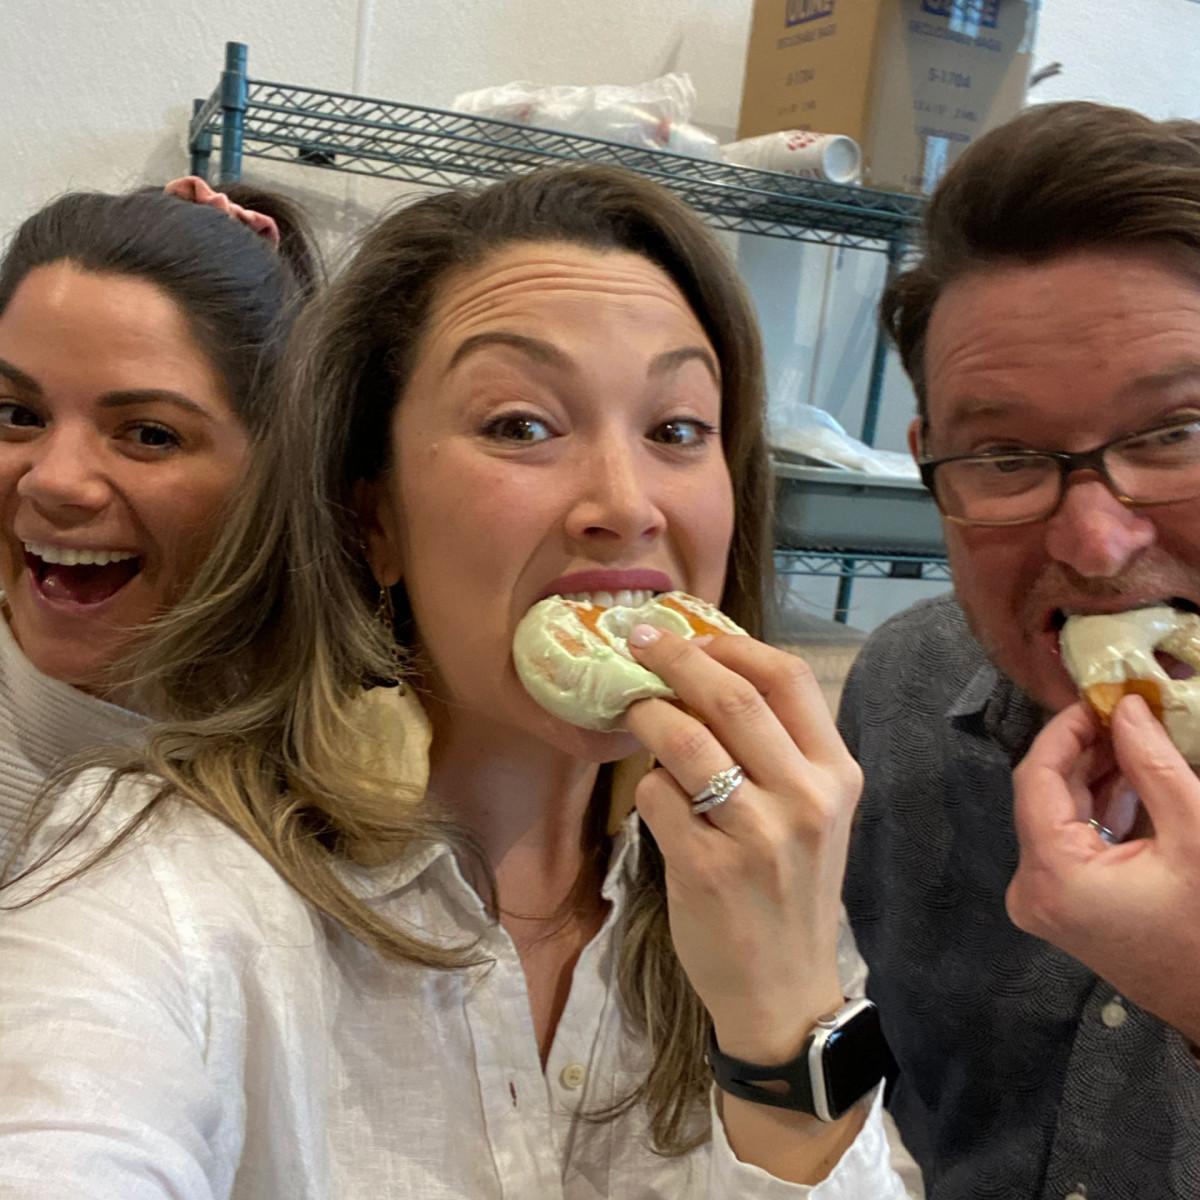 Candid photo of Salt Paper Studio team members eating doughnuts together